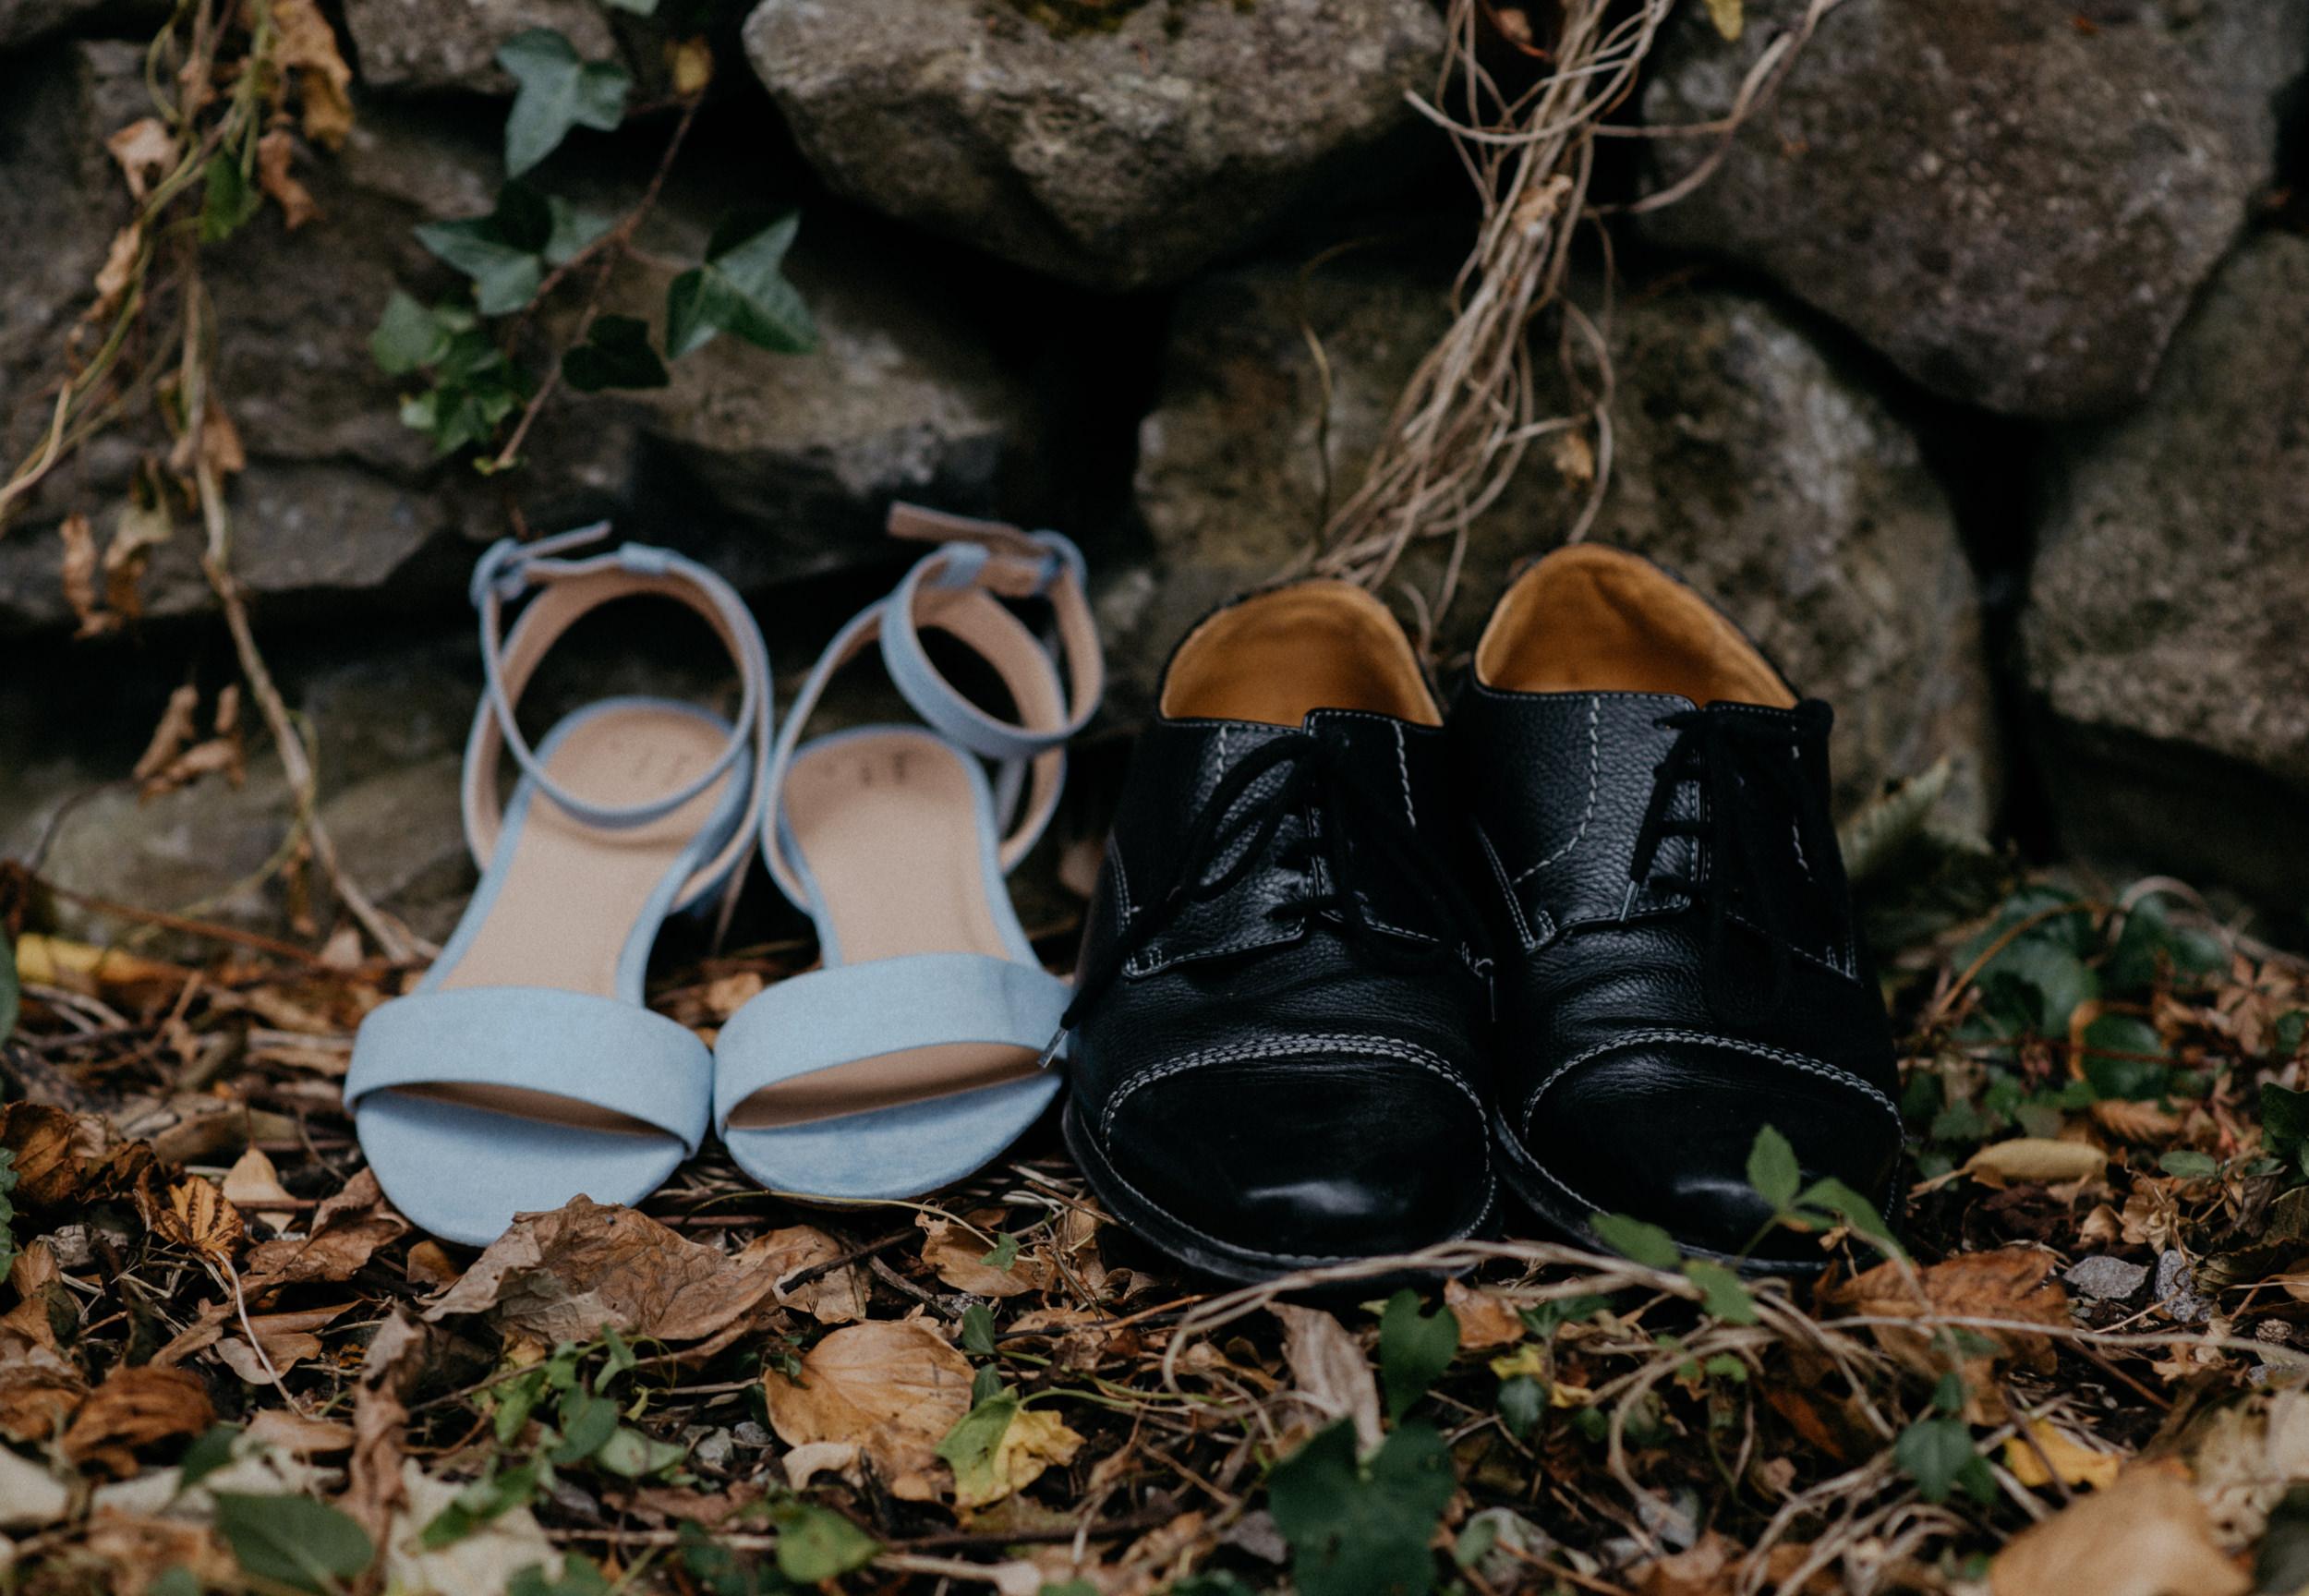 Bride and groom wedding shoes. Ireland destination wedding and elopement photographer.